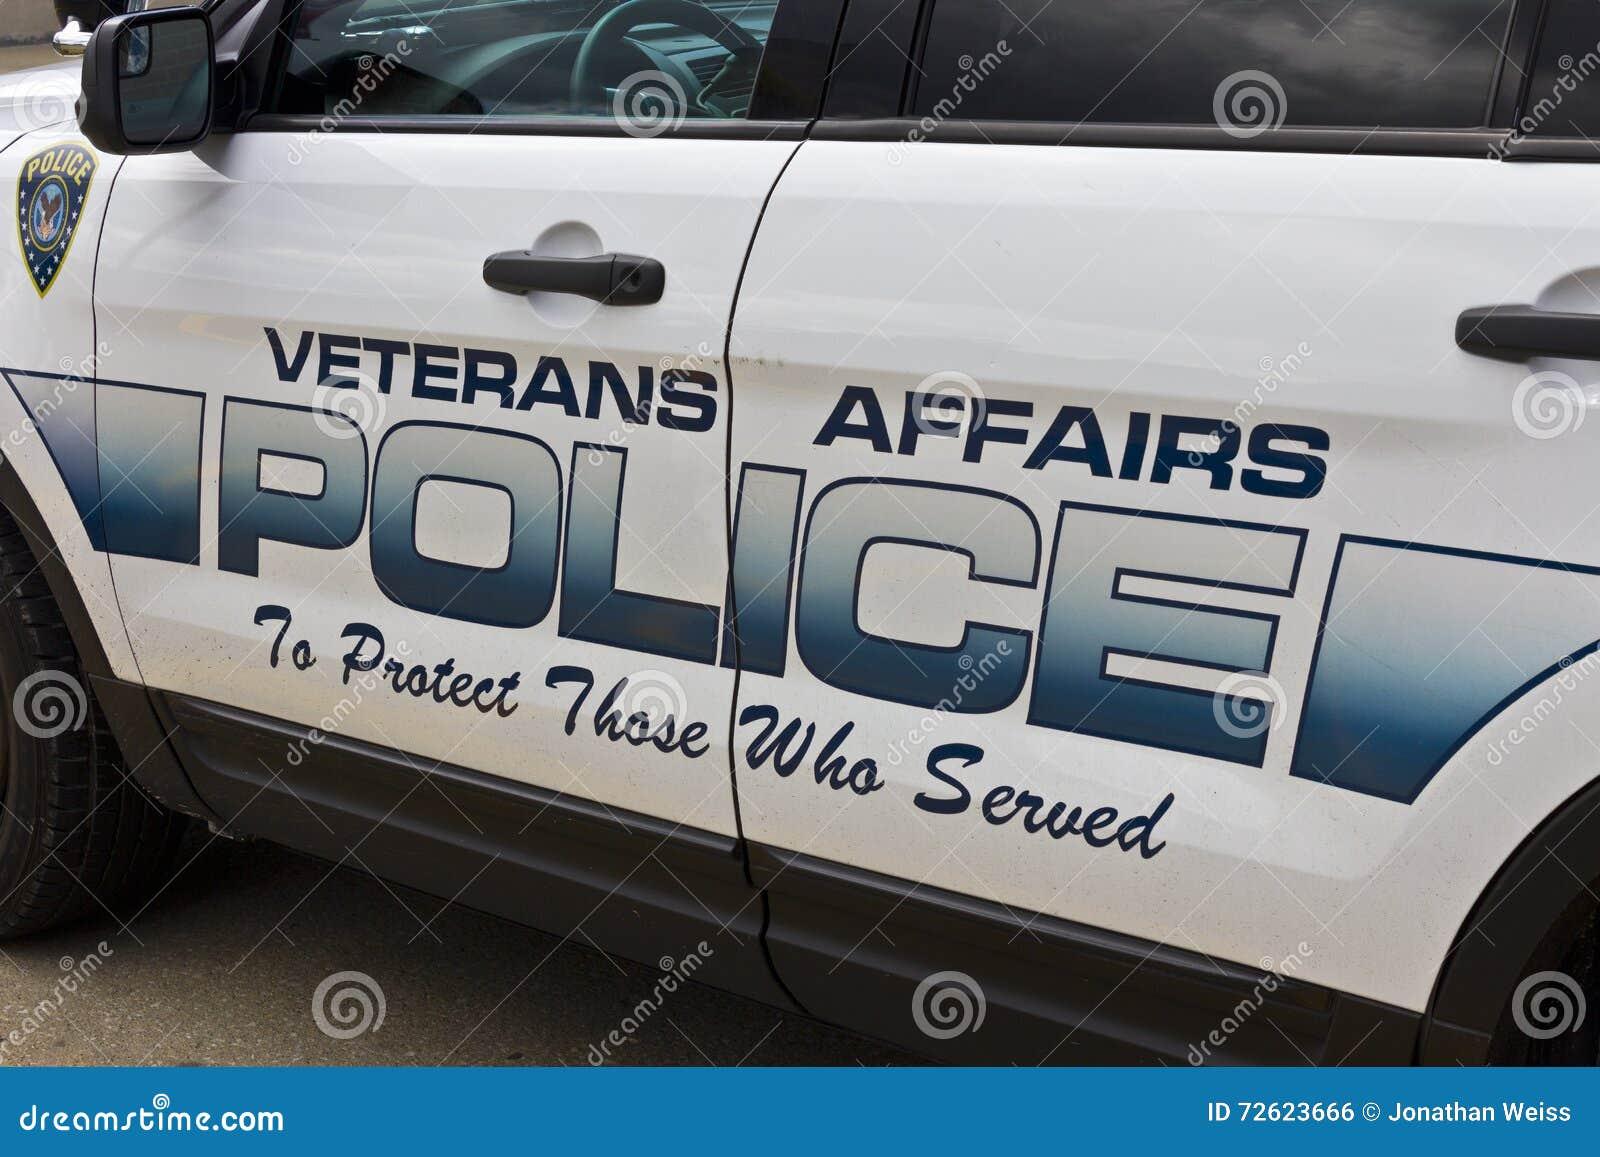 Veterans Affairs Police At The Roudebush Va Medical Center I